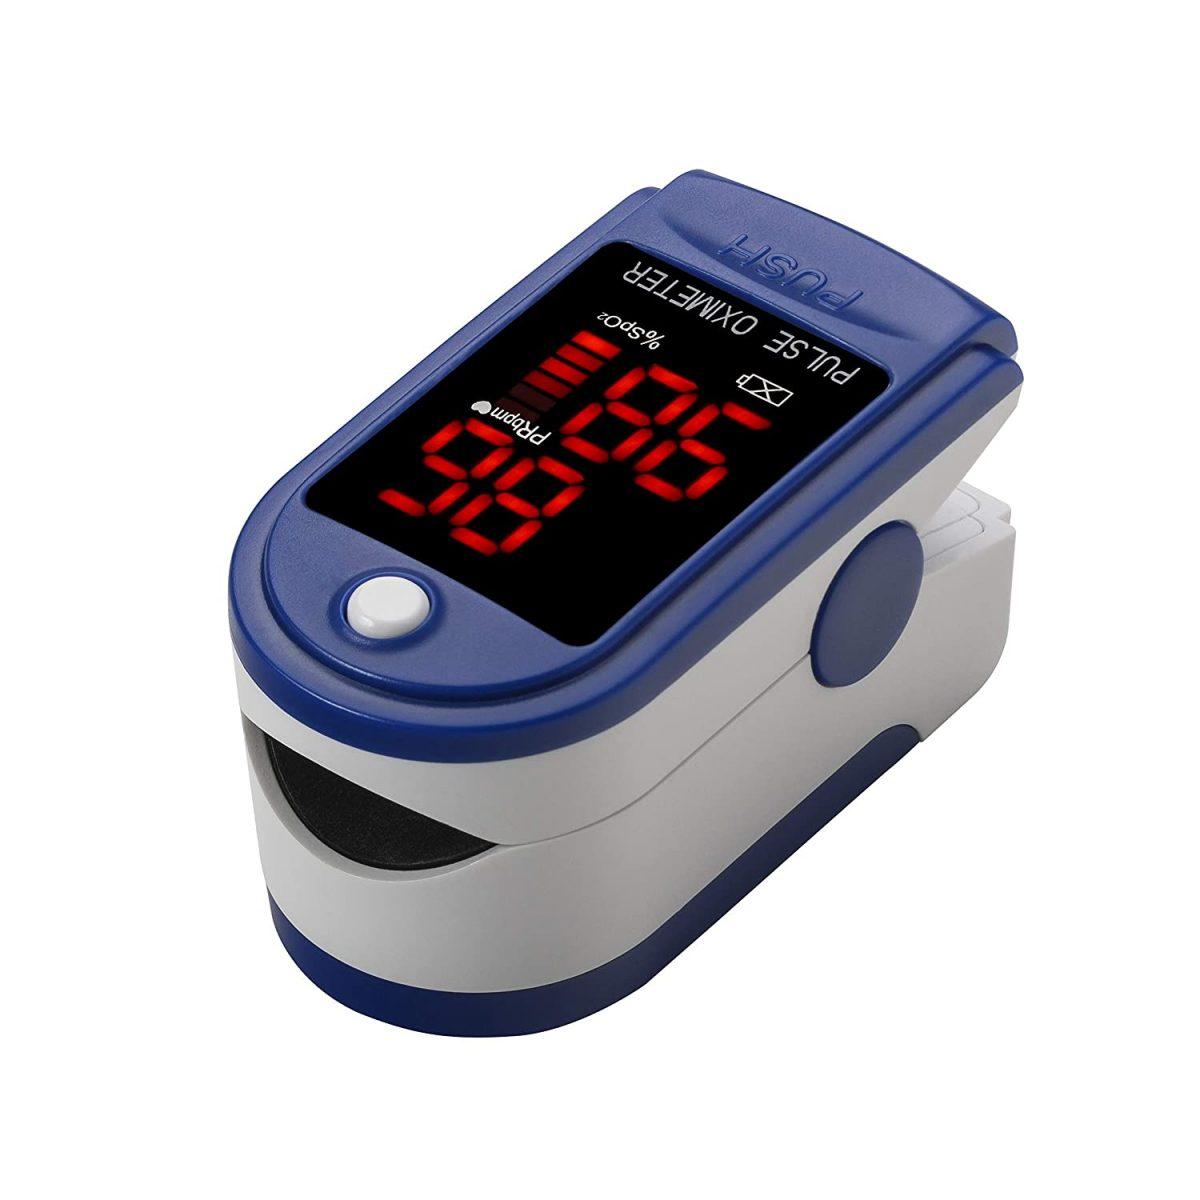 Contec Finger tip Pulse oximeter for sale in Accra Ghana 1